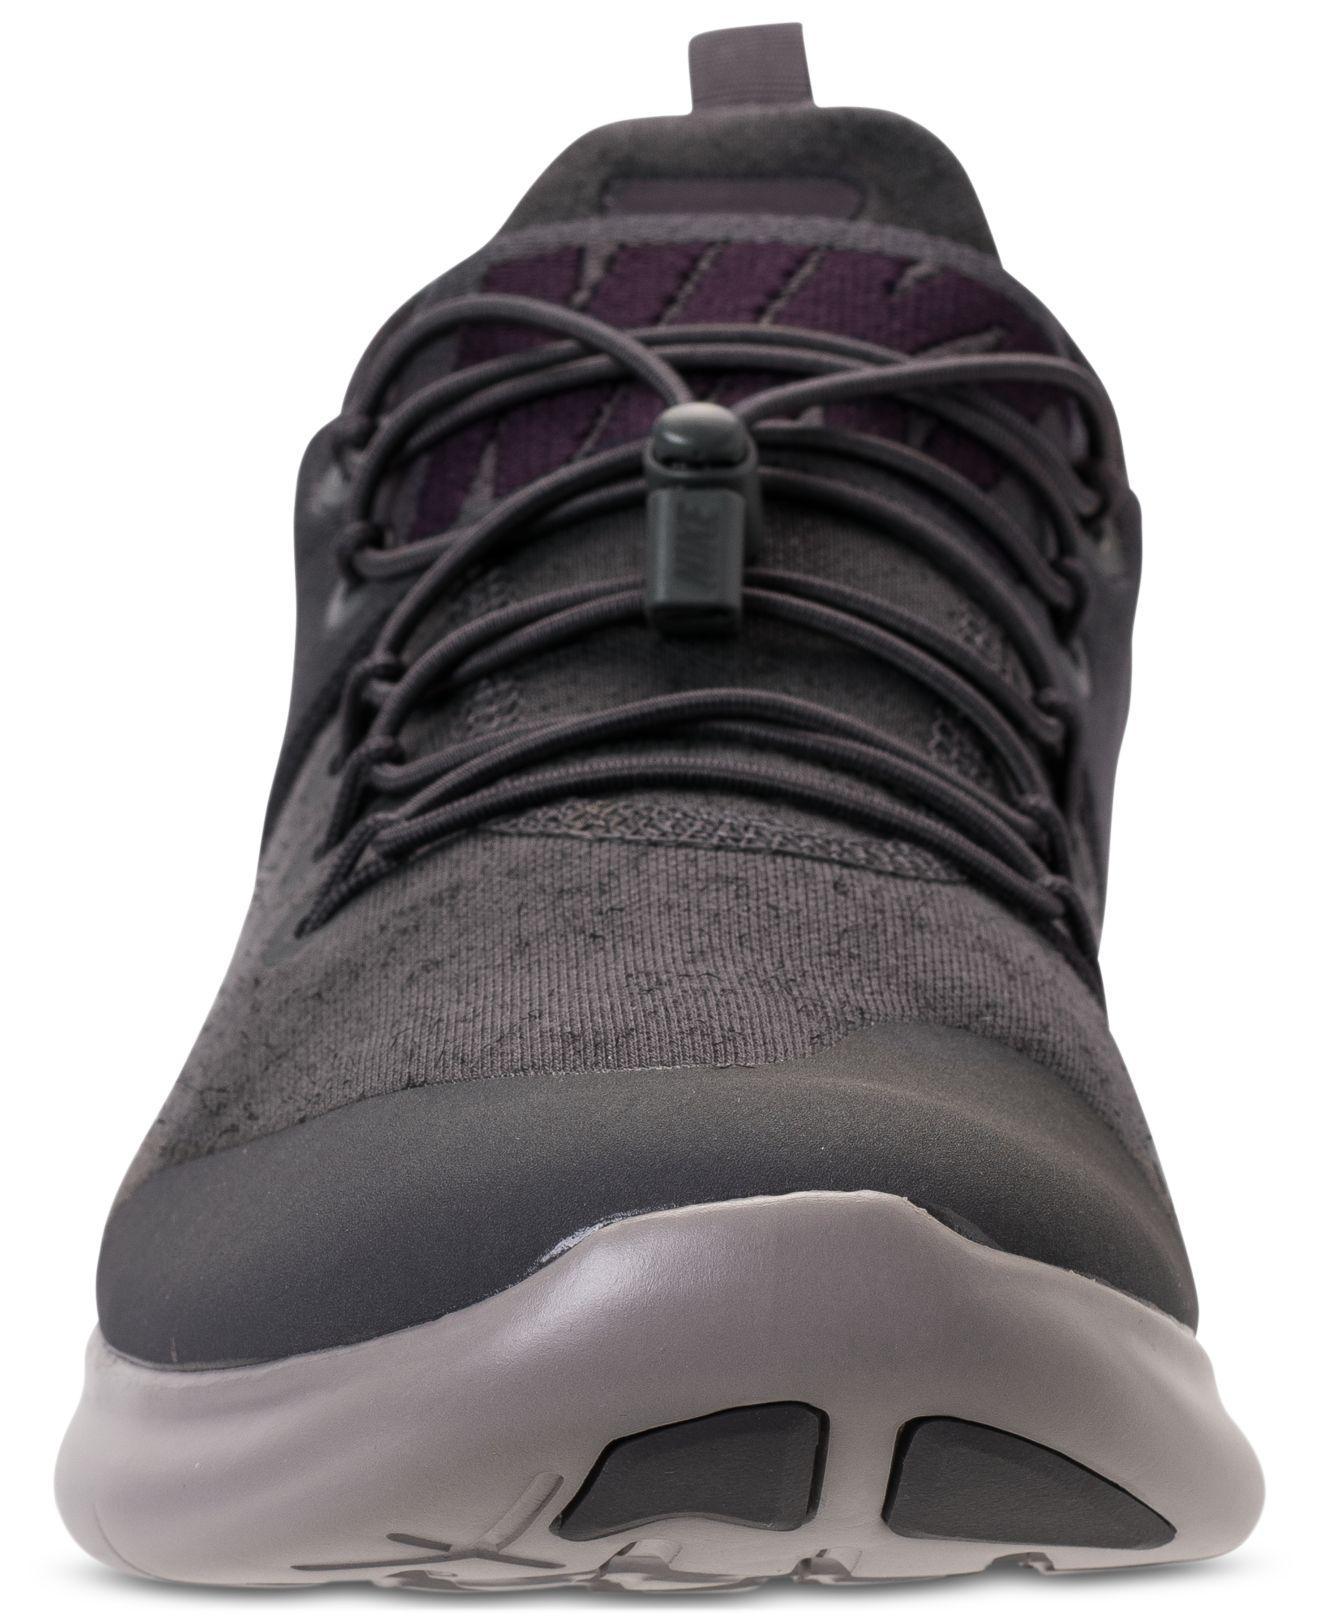 b1100cb03038c Lyst - Nike Men s Free Rn Commuter Premium 2017 Running Sneakers ...